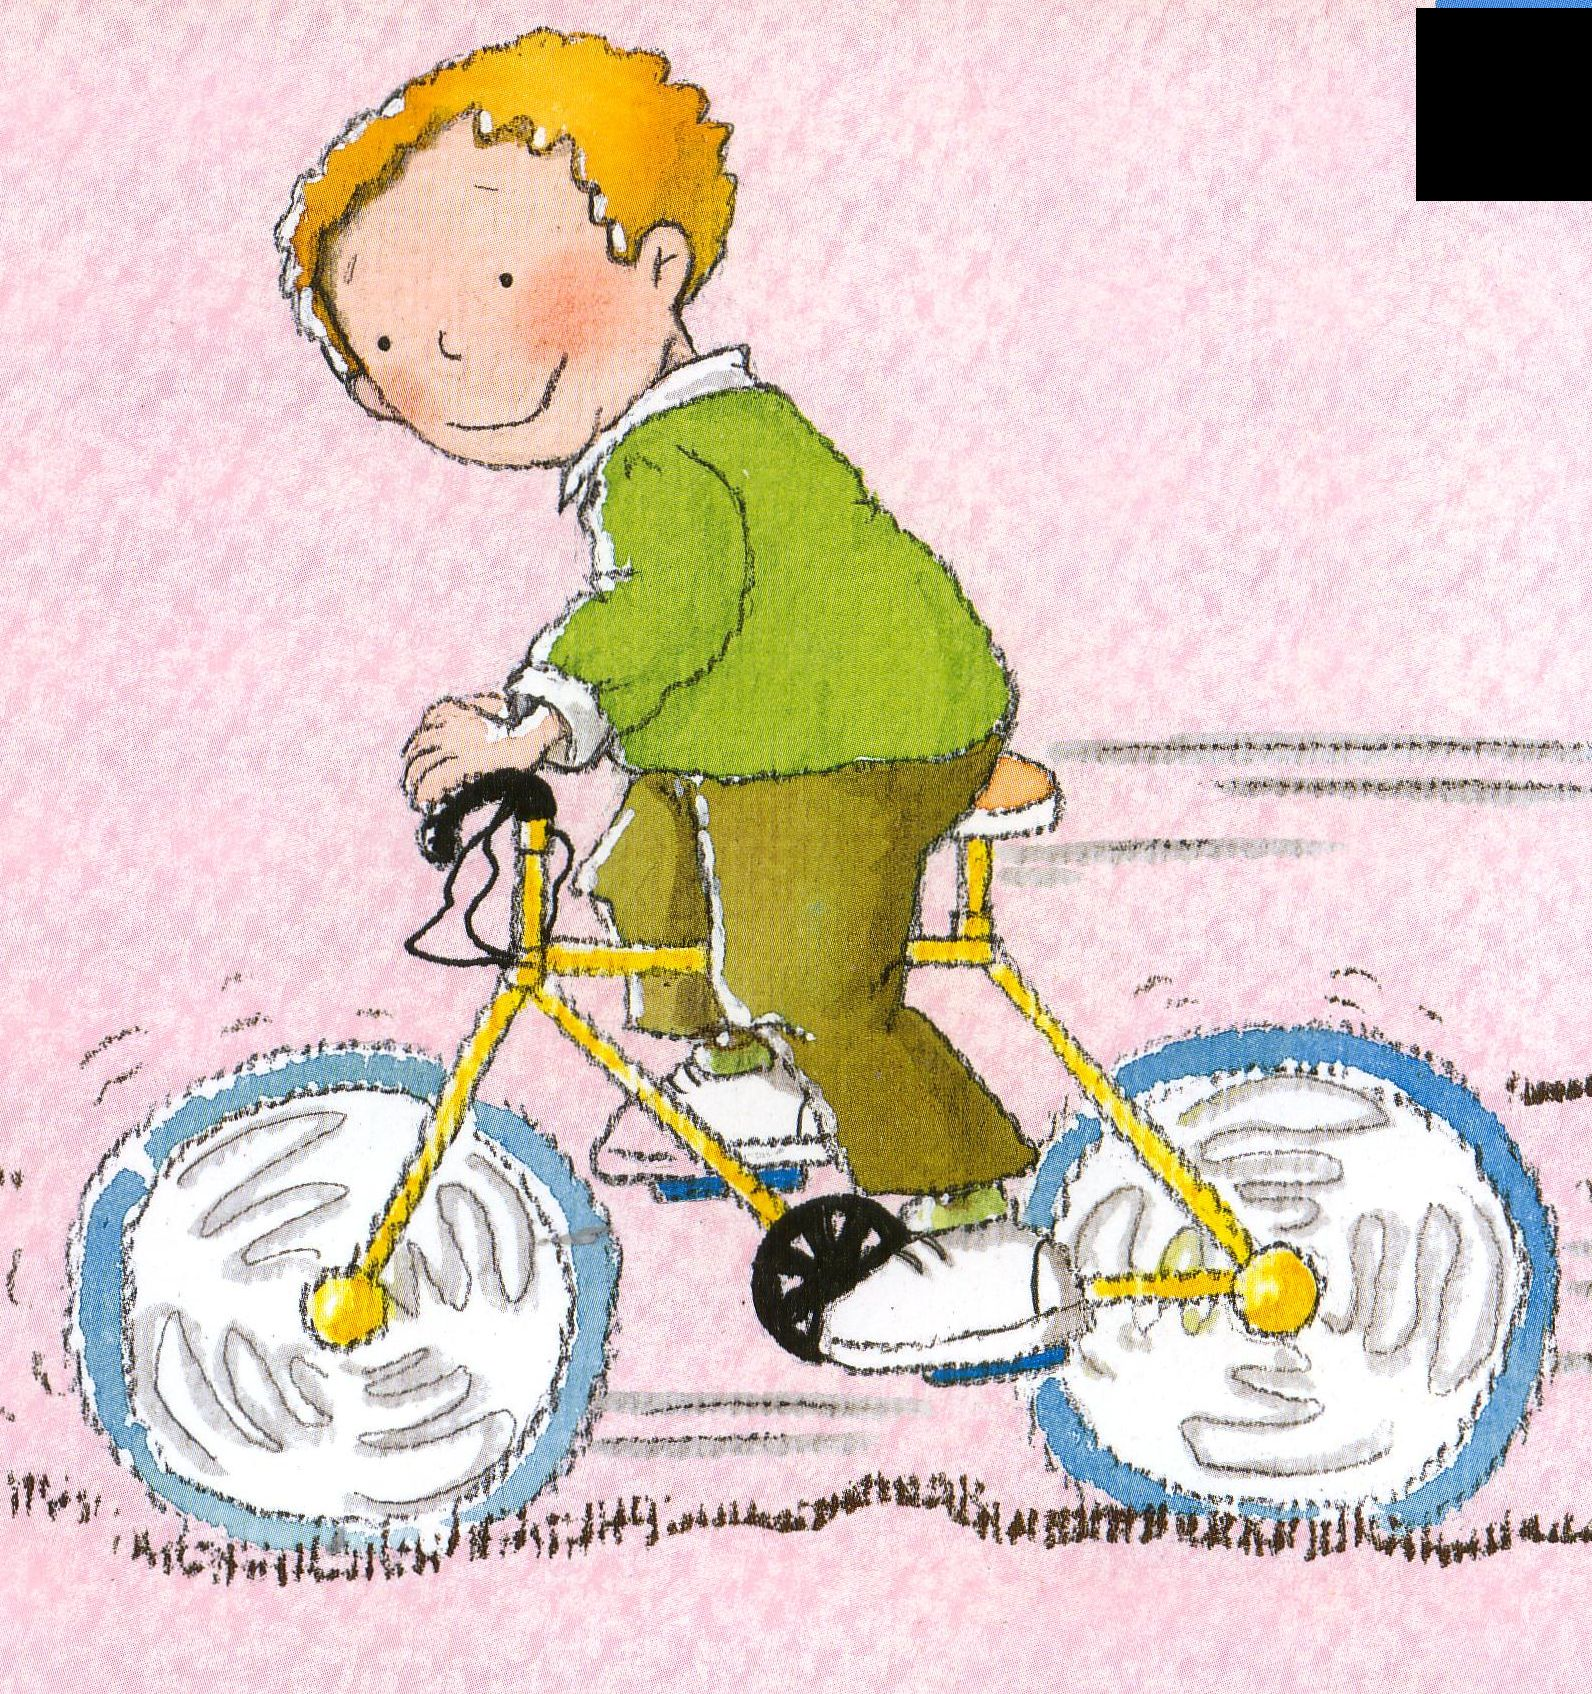 bambino-in-bici1